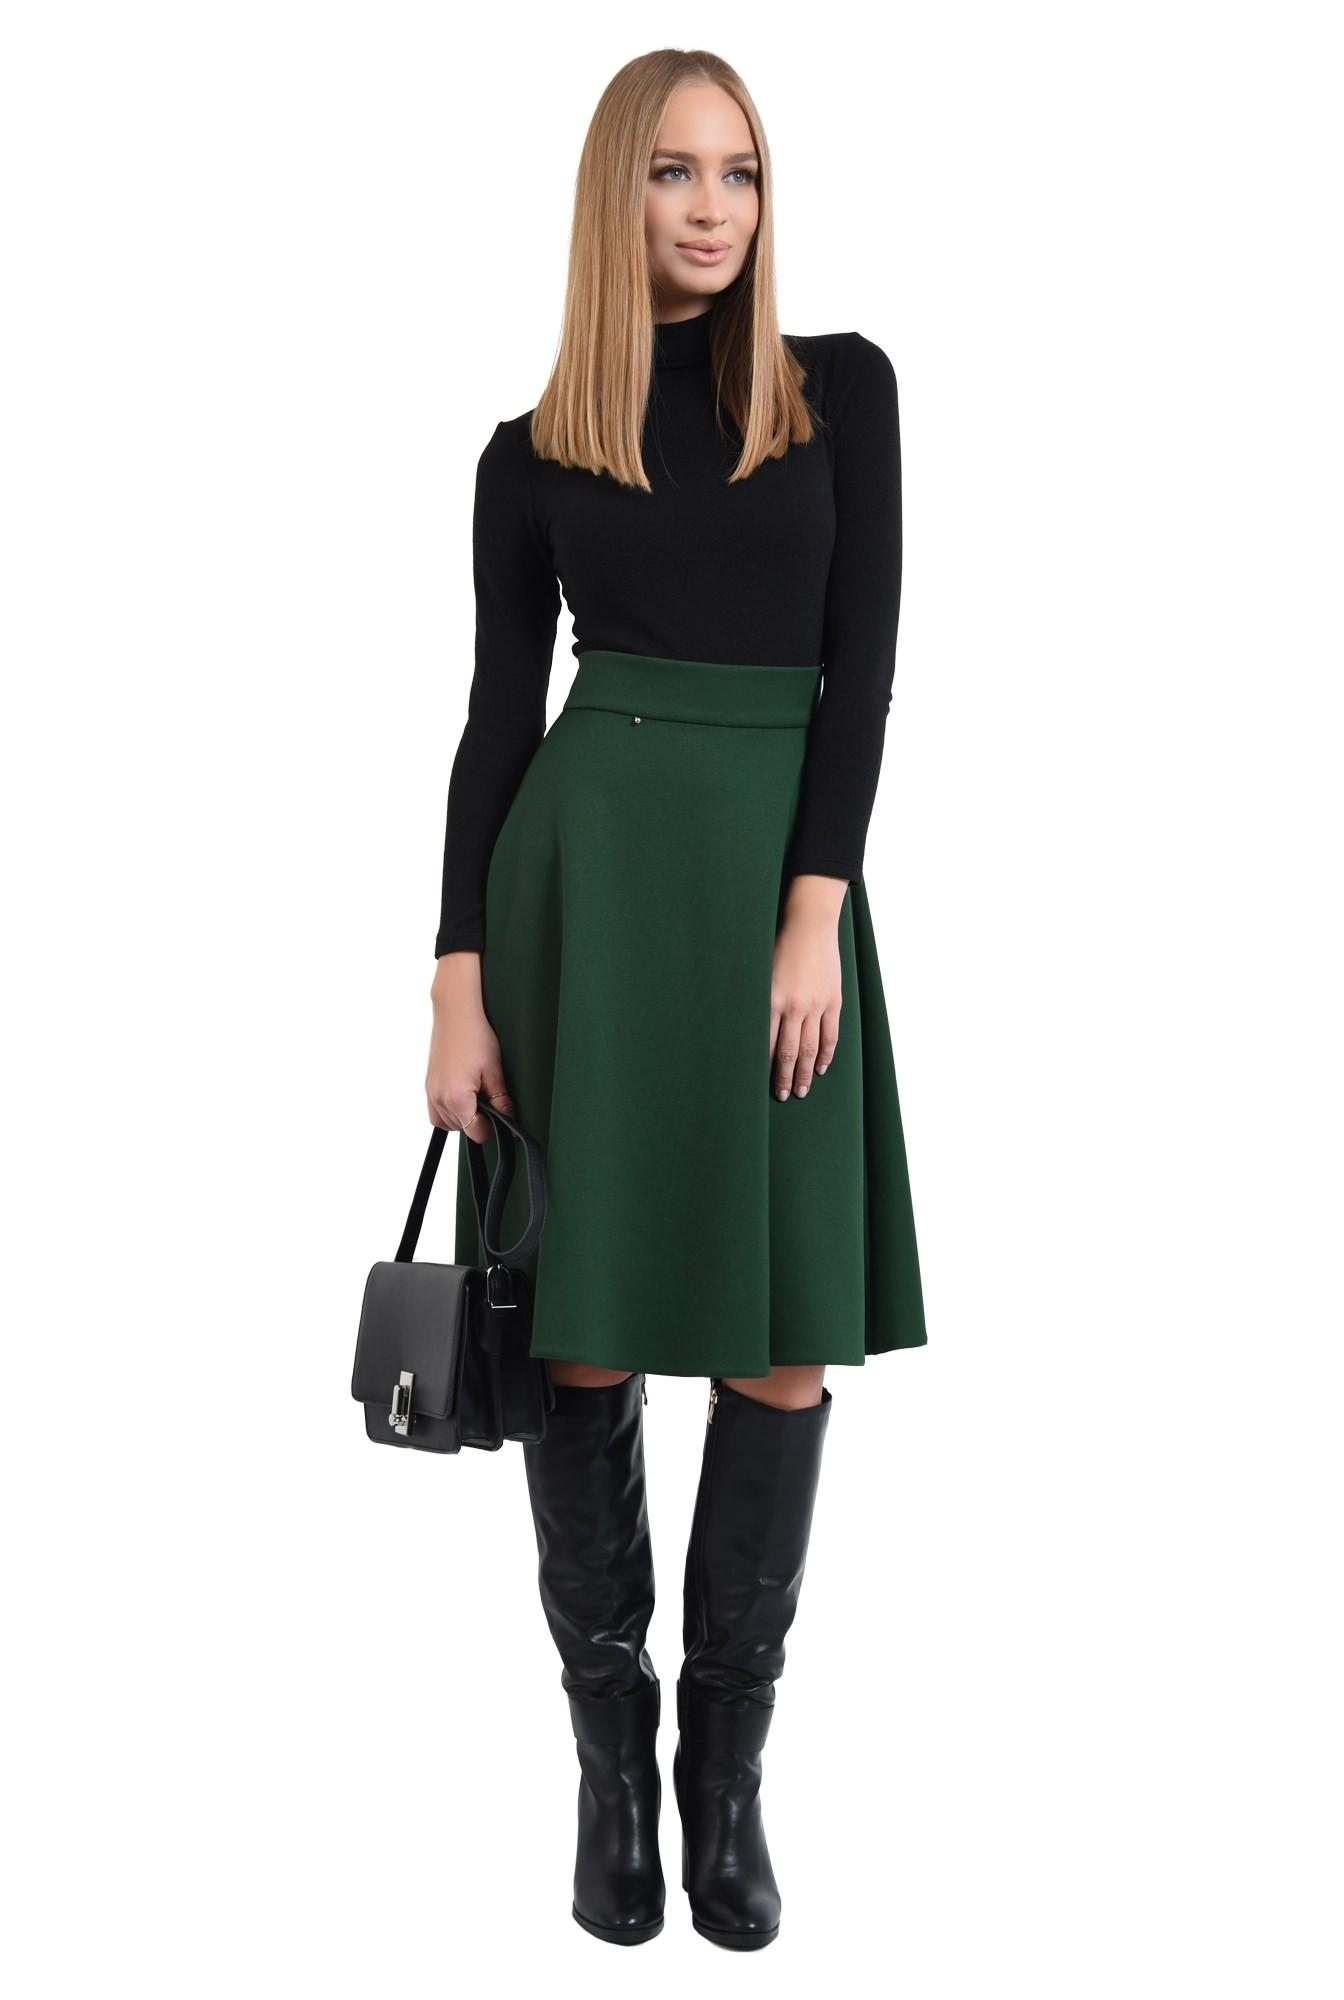 0 - fusta verde, clos, midi, tesatura elastica